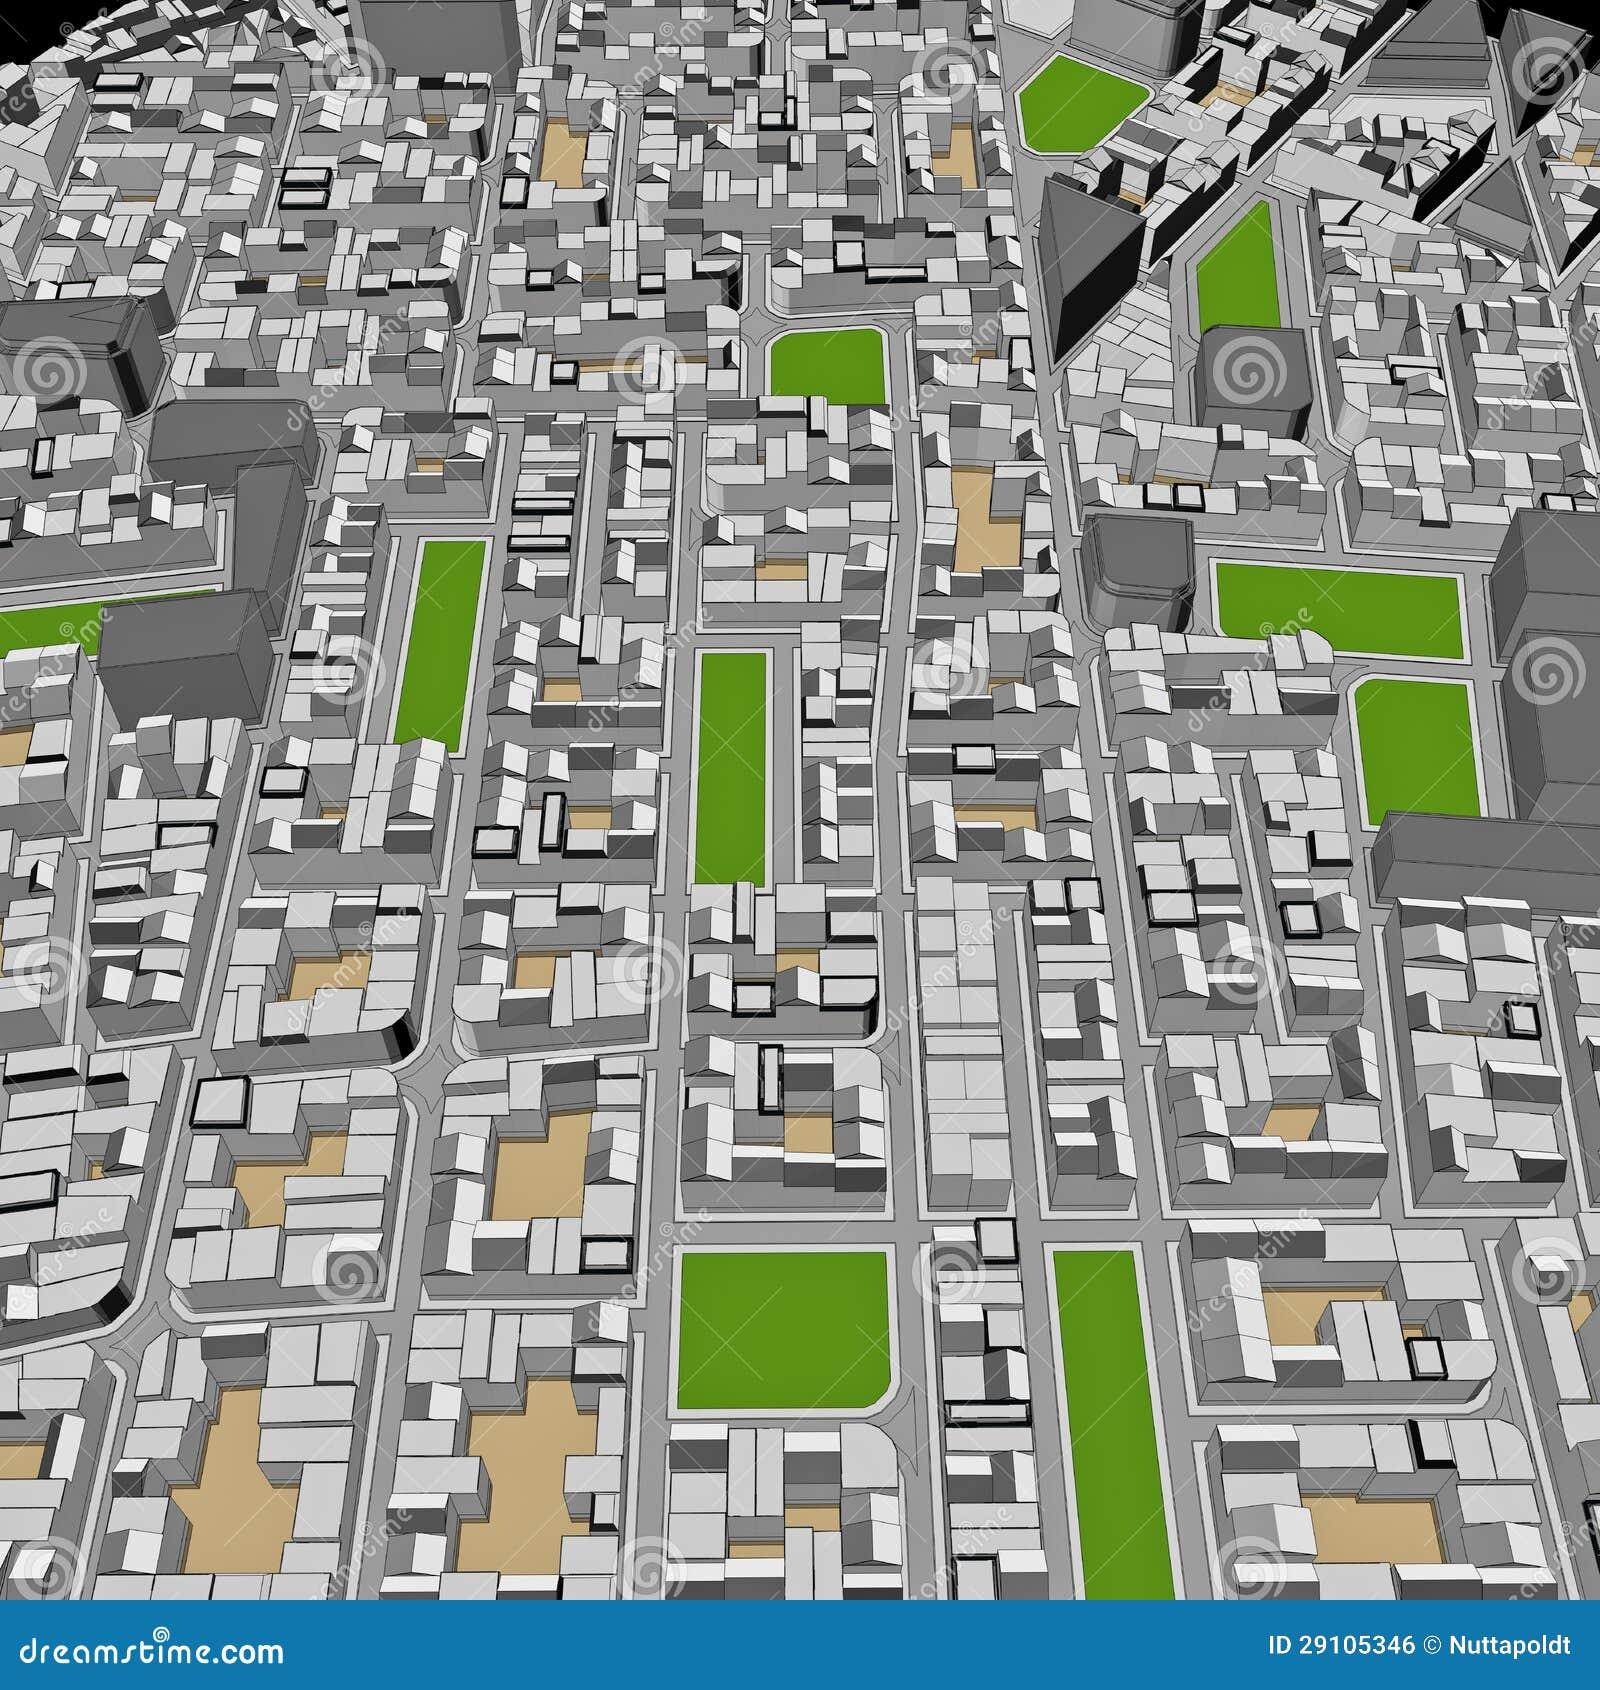 Cartoon town bird eye view urban